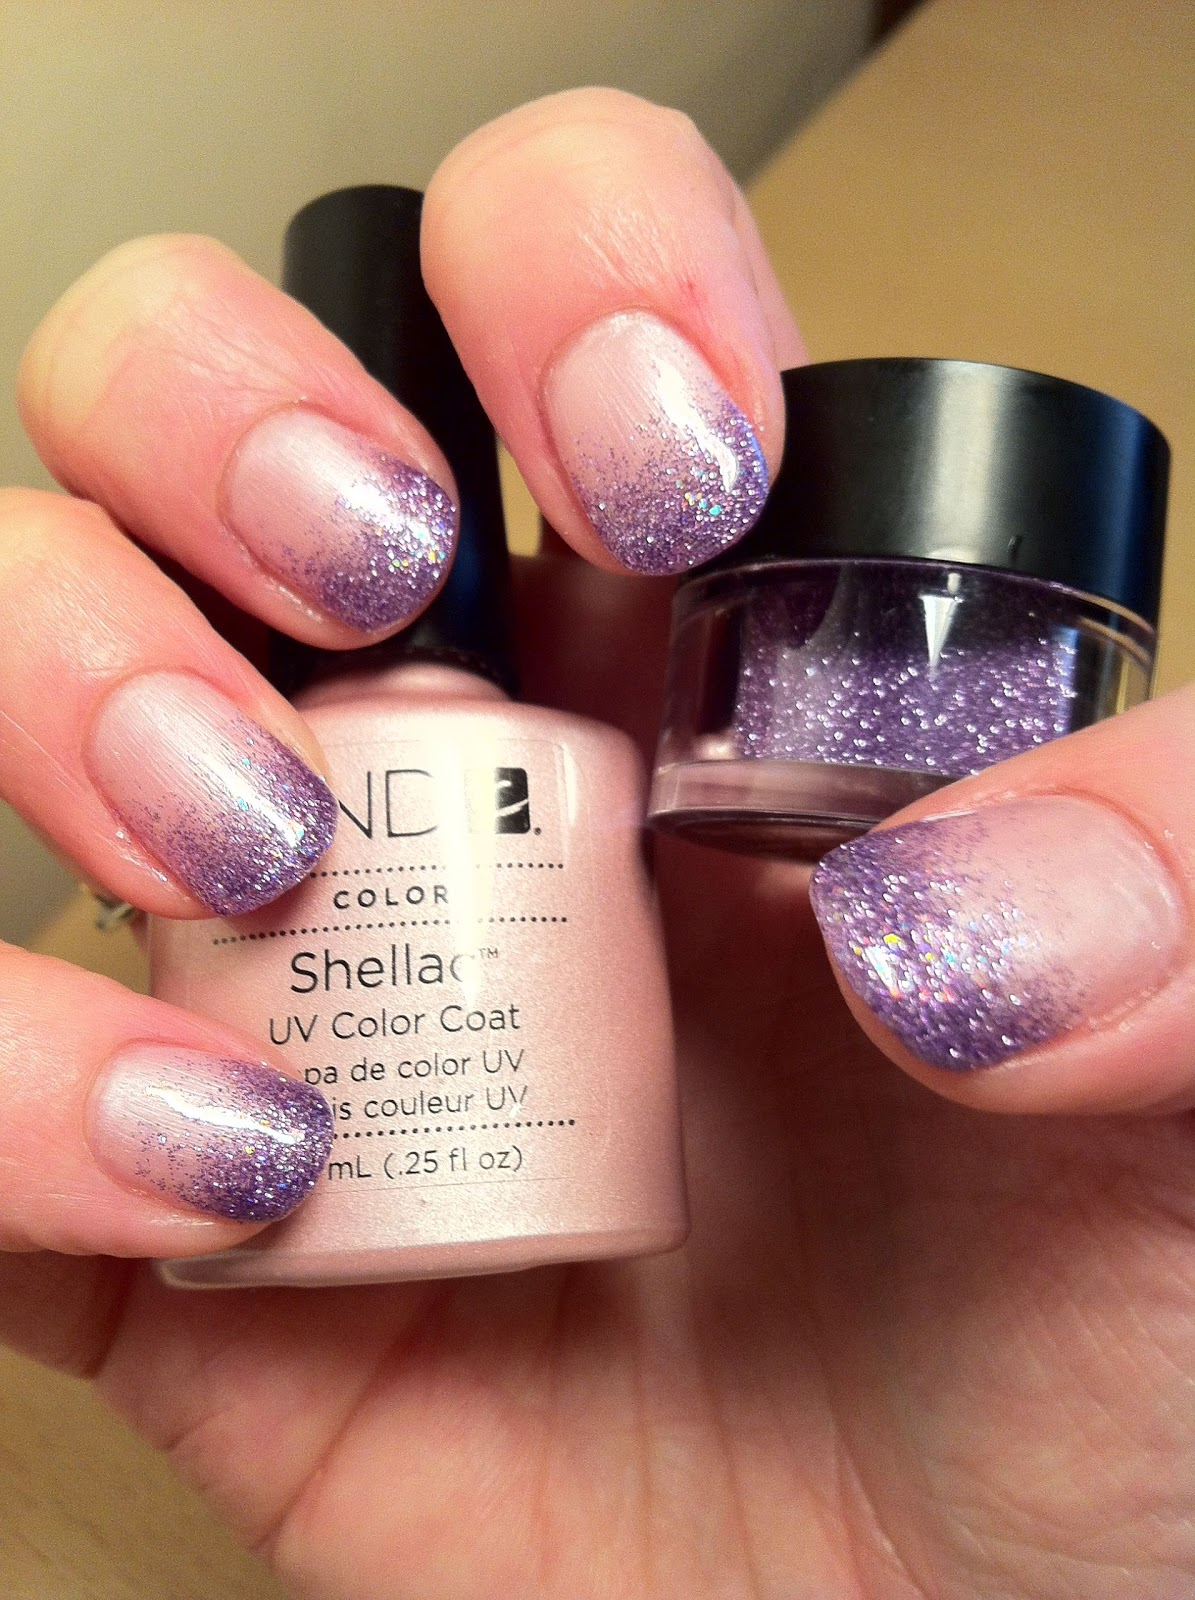 Shellac Nail Designs - Pccala